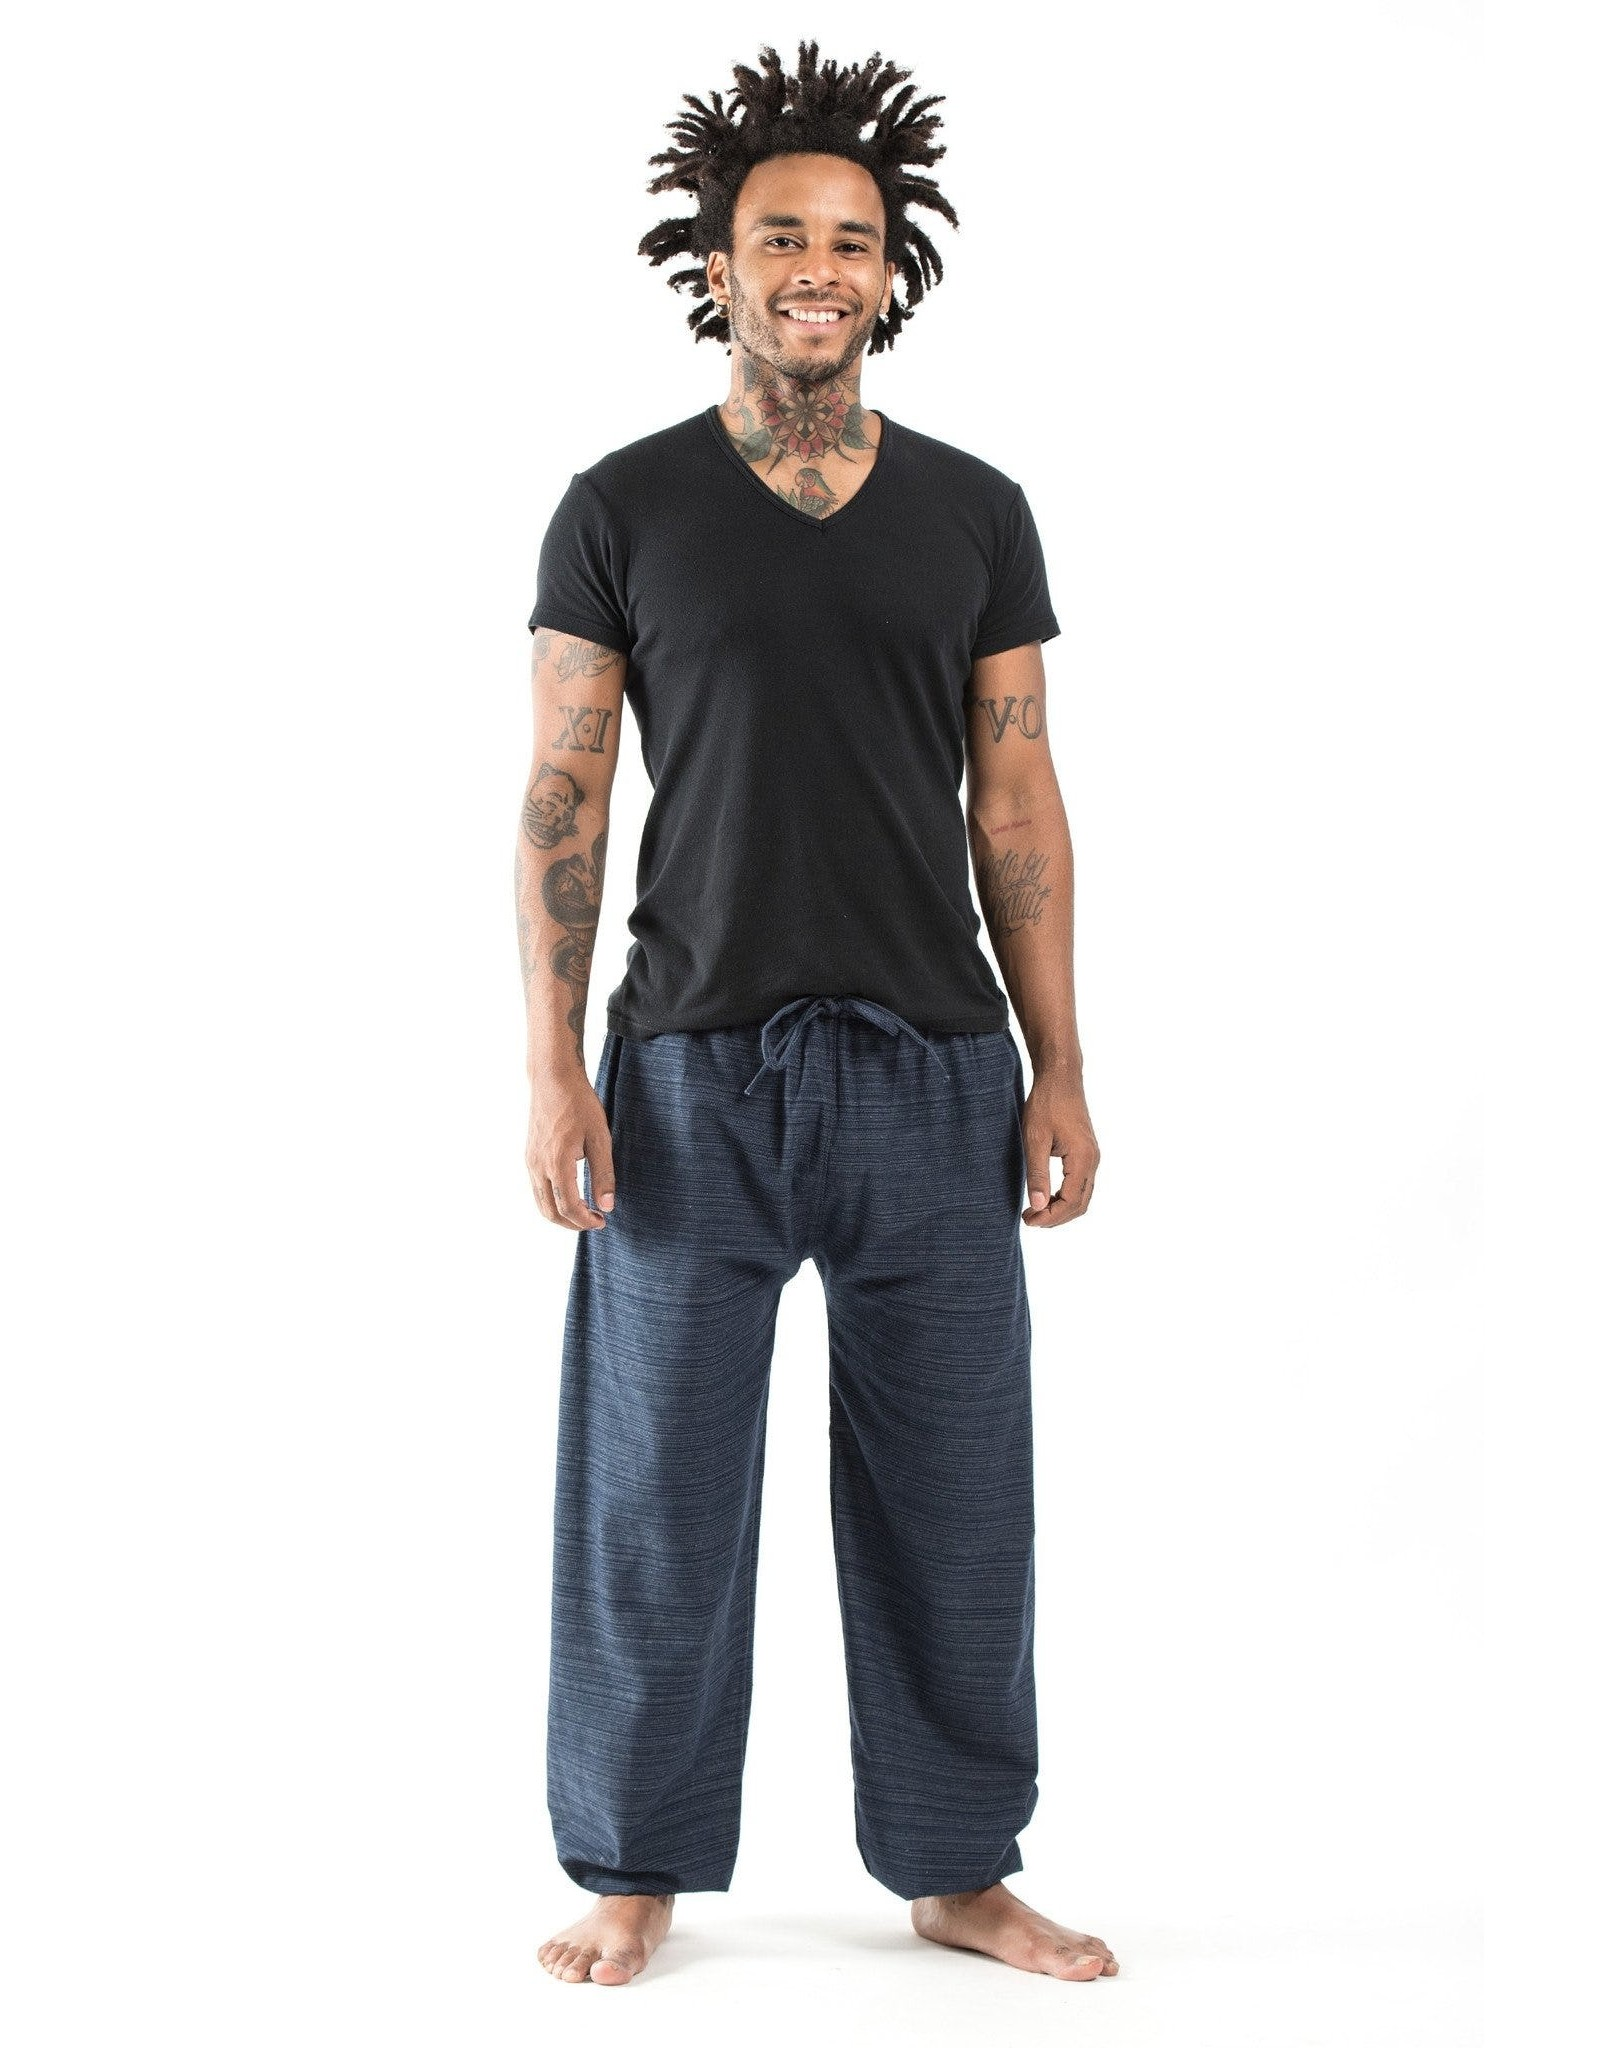 Tribal Top, Low Crotch Harem Pin Stripe Pants,  Navy